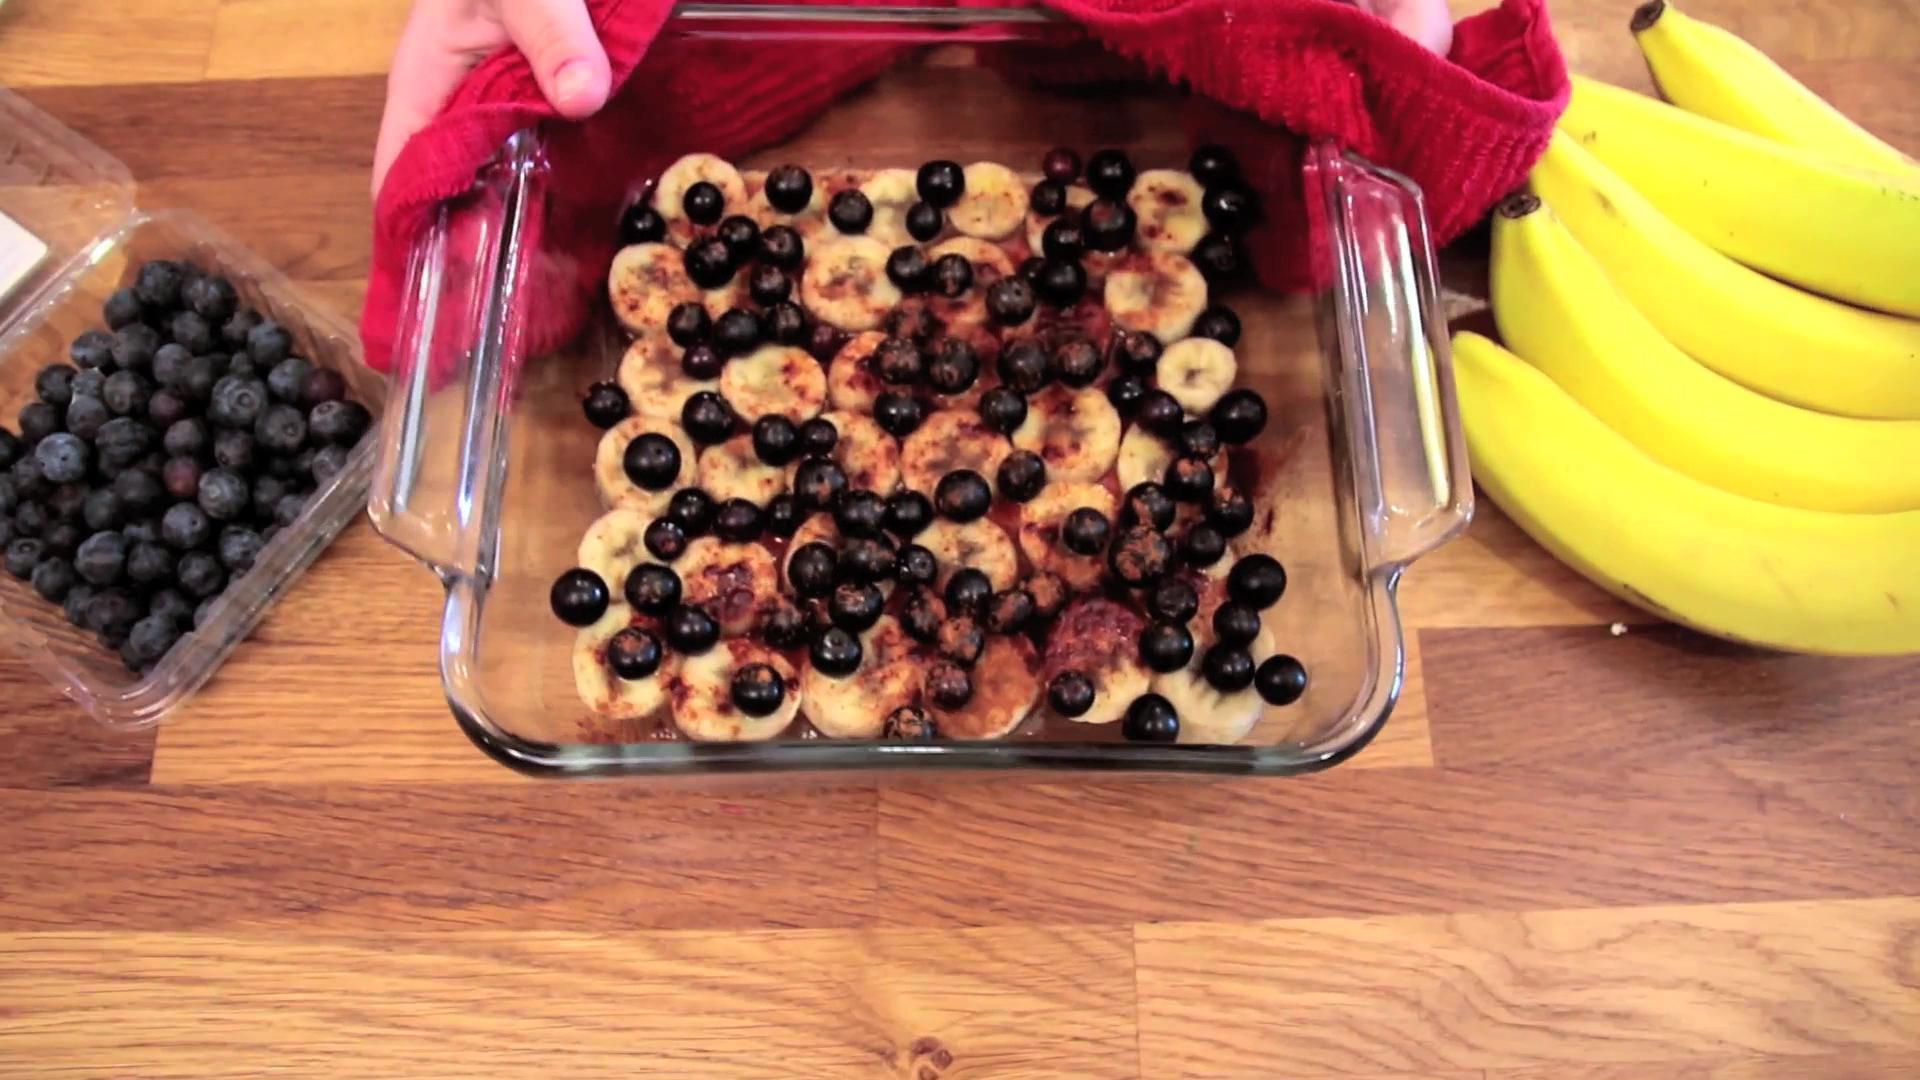 Banana and Blueberry Baked Oatmeal